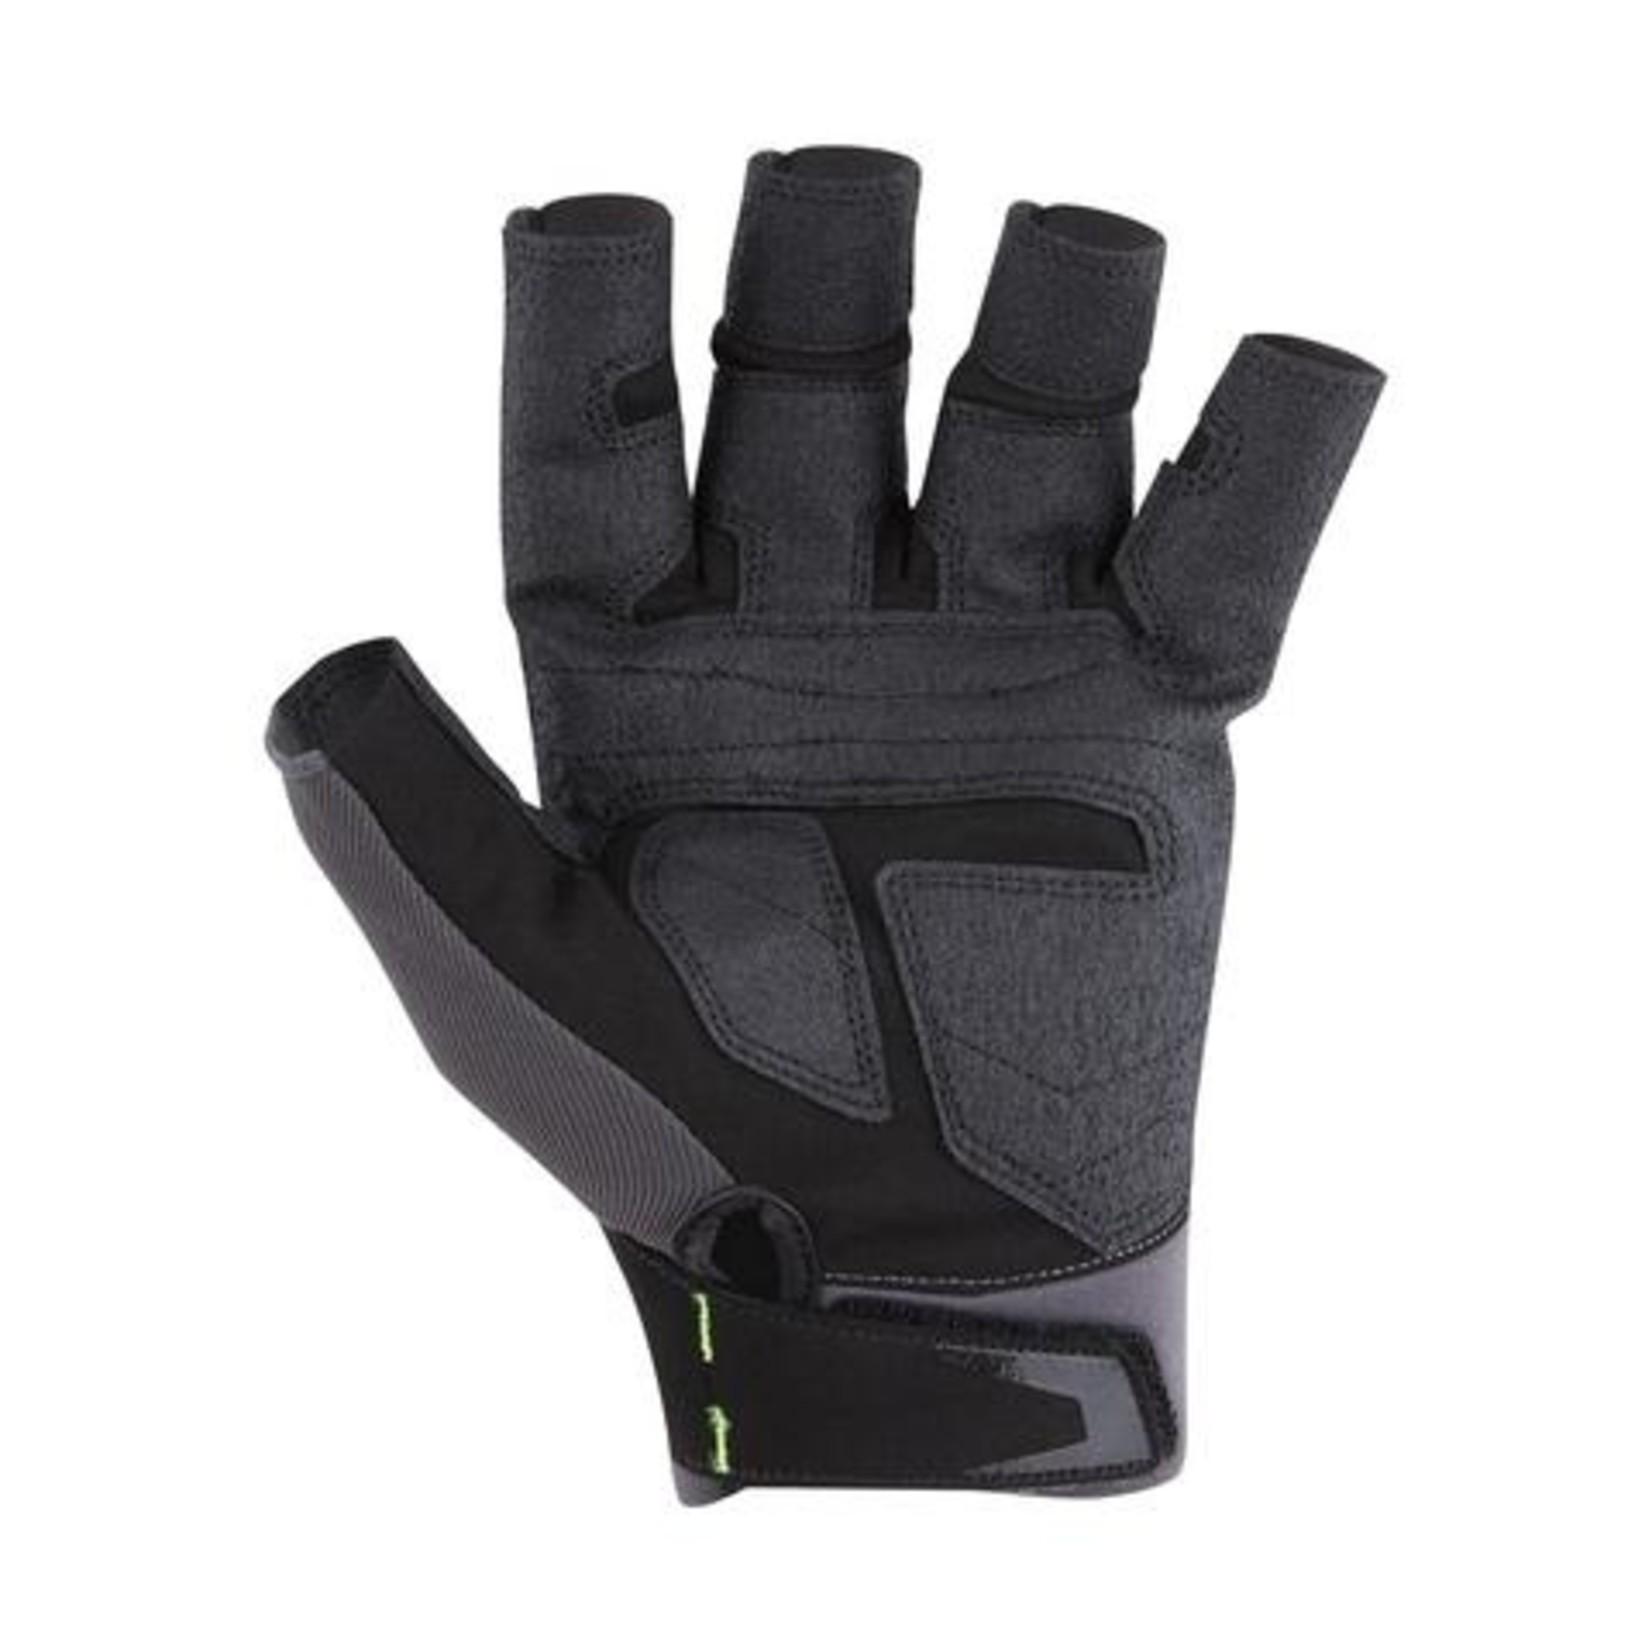 Mustang Survival Mustang Survival EP 3250 Open Finger Gloves - Updated